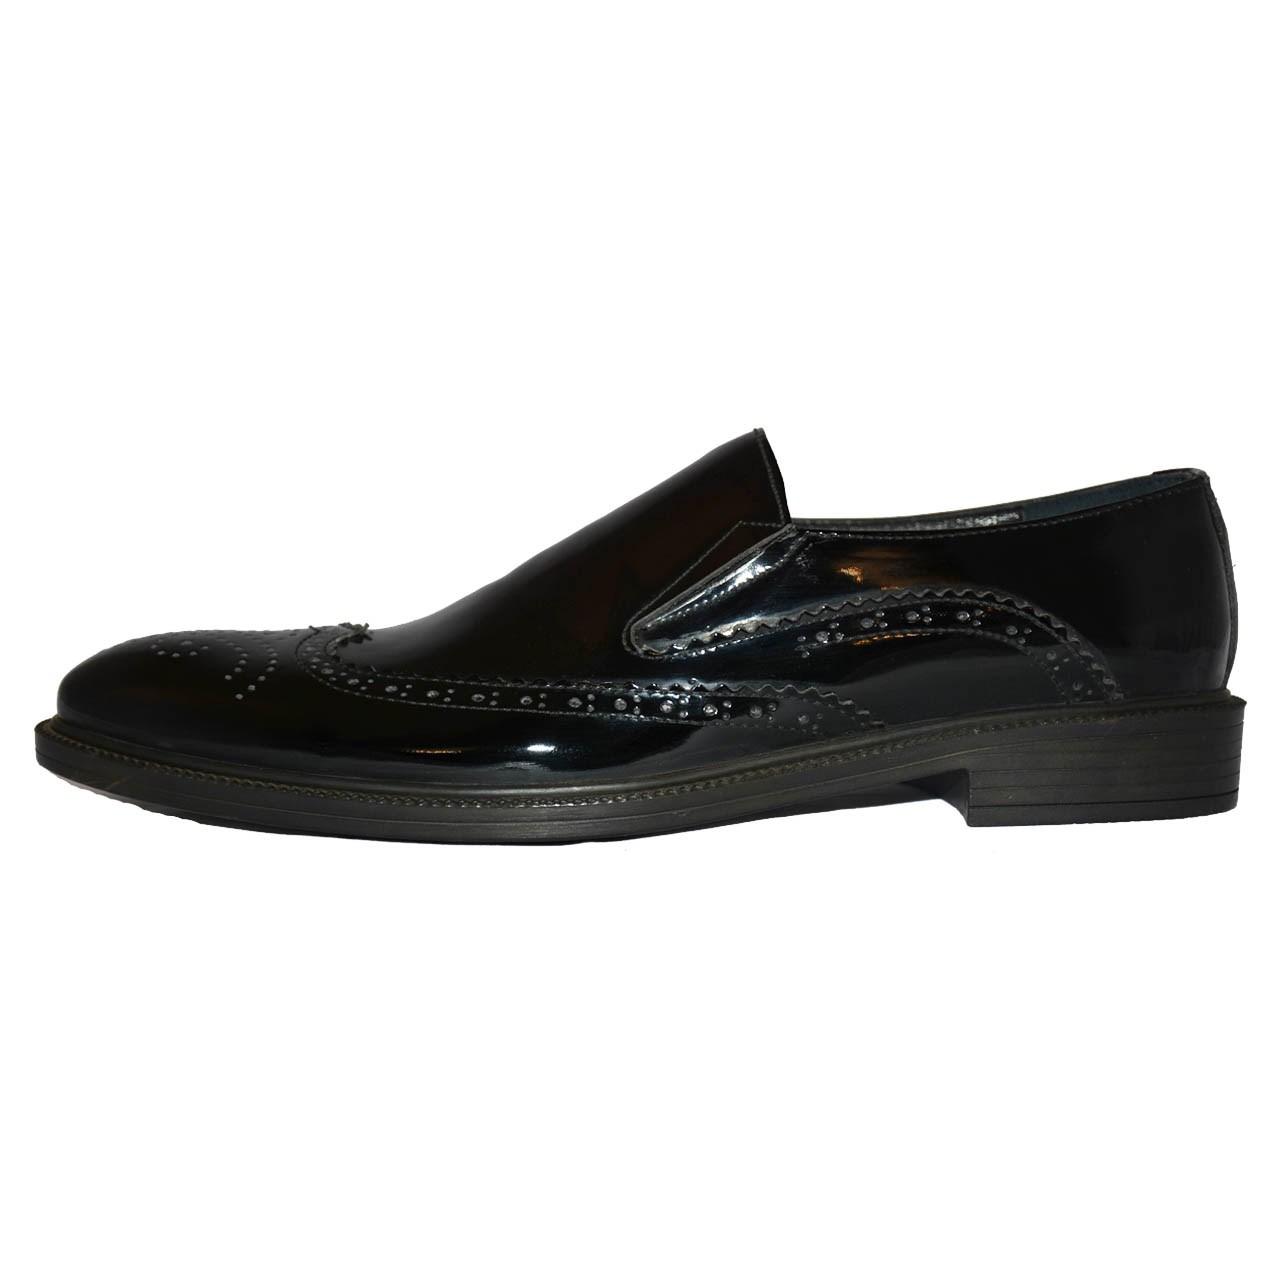 کفش مردانه جی سی کد 00062